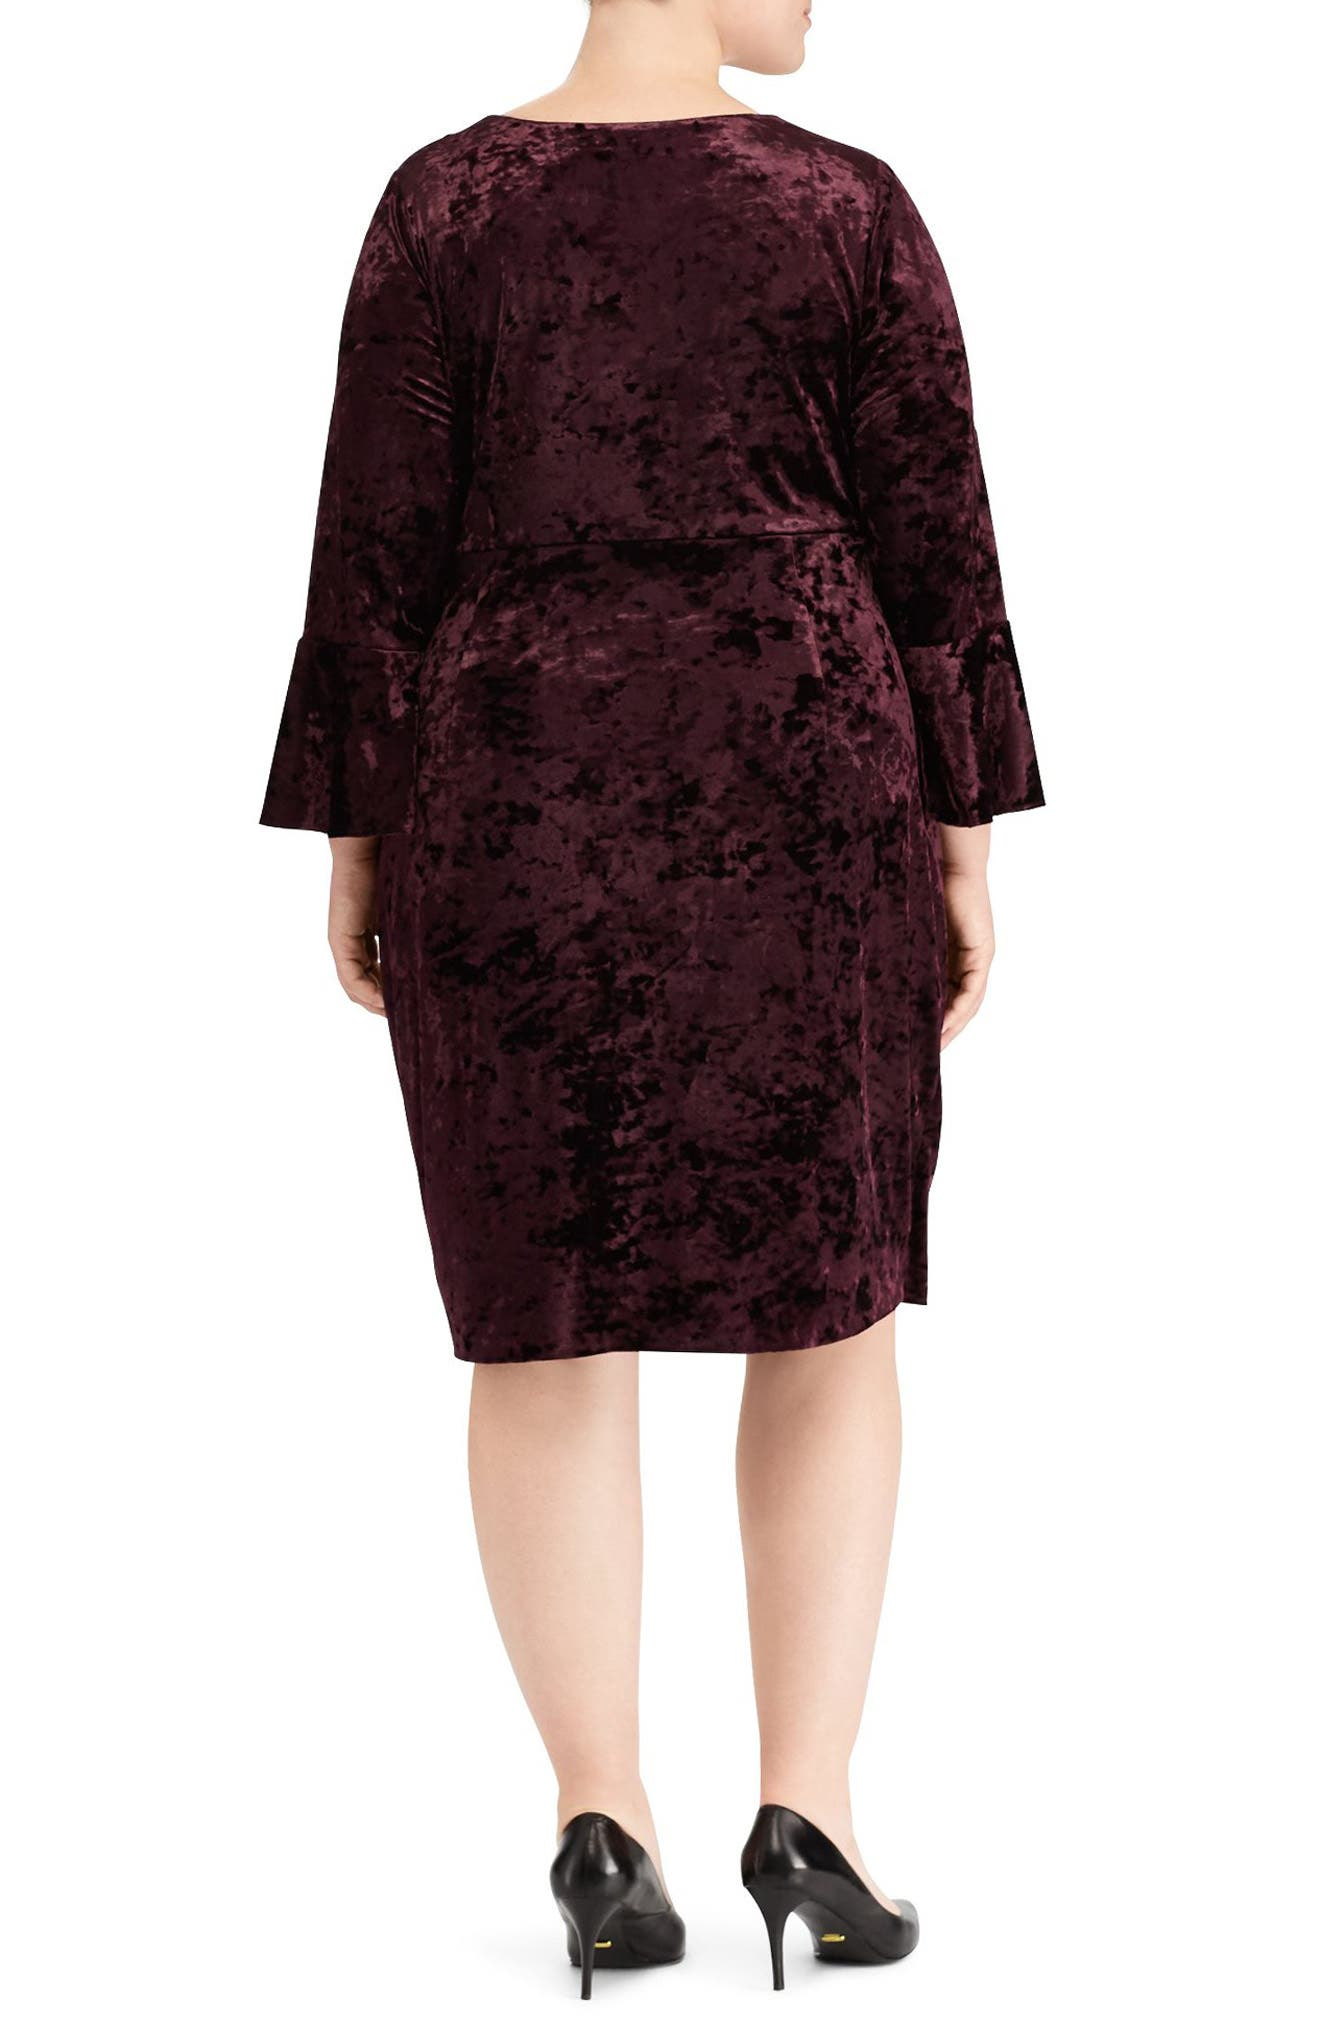 Ruched Crushed Velvet Sheath Dress,                             Alternate thumbnail 2, color,